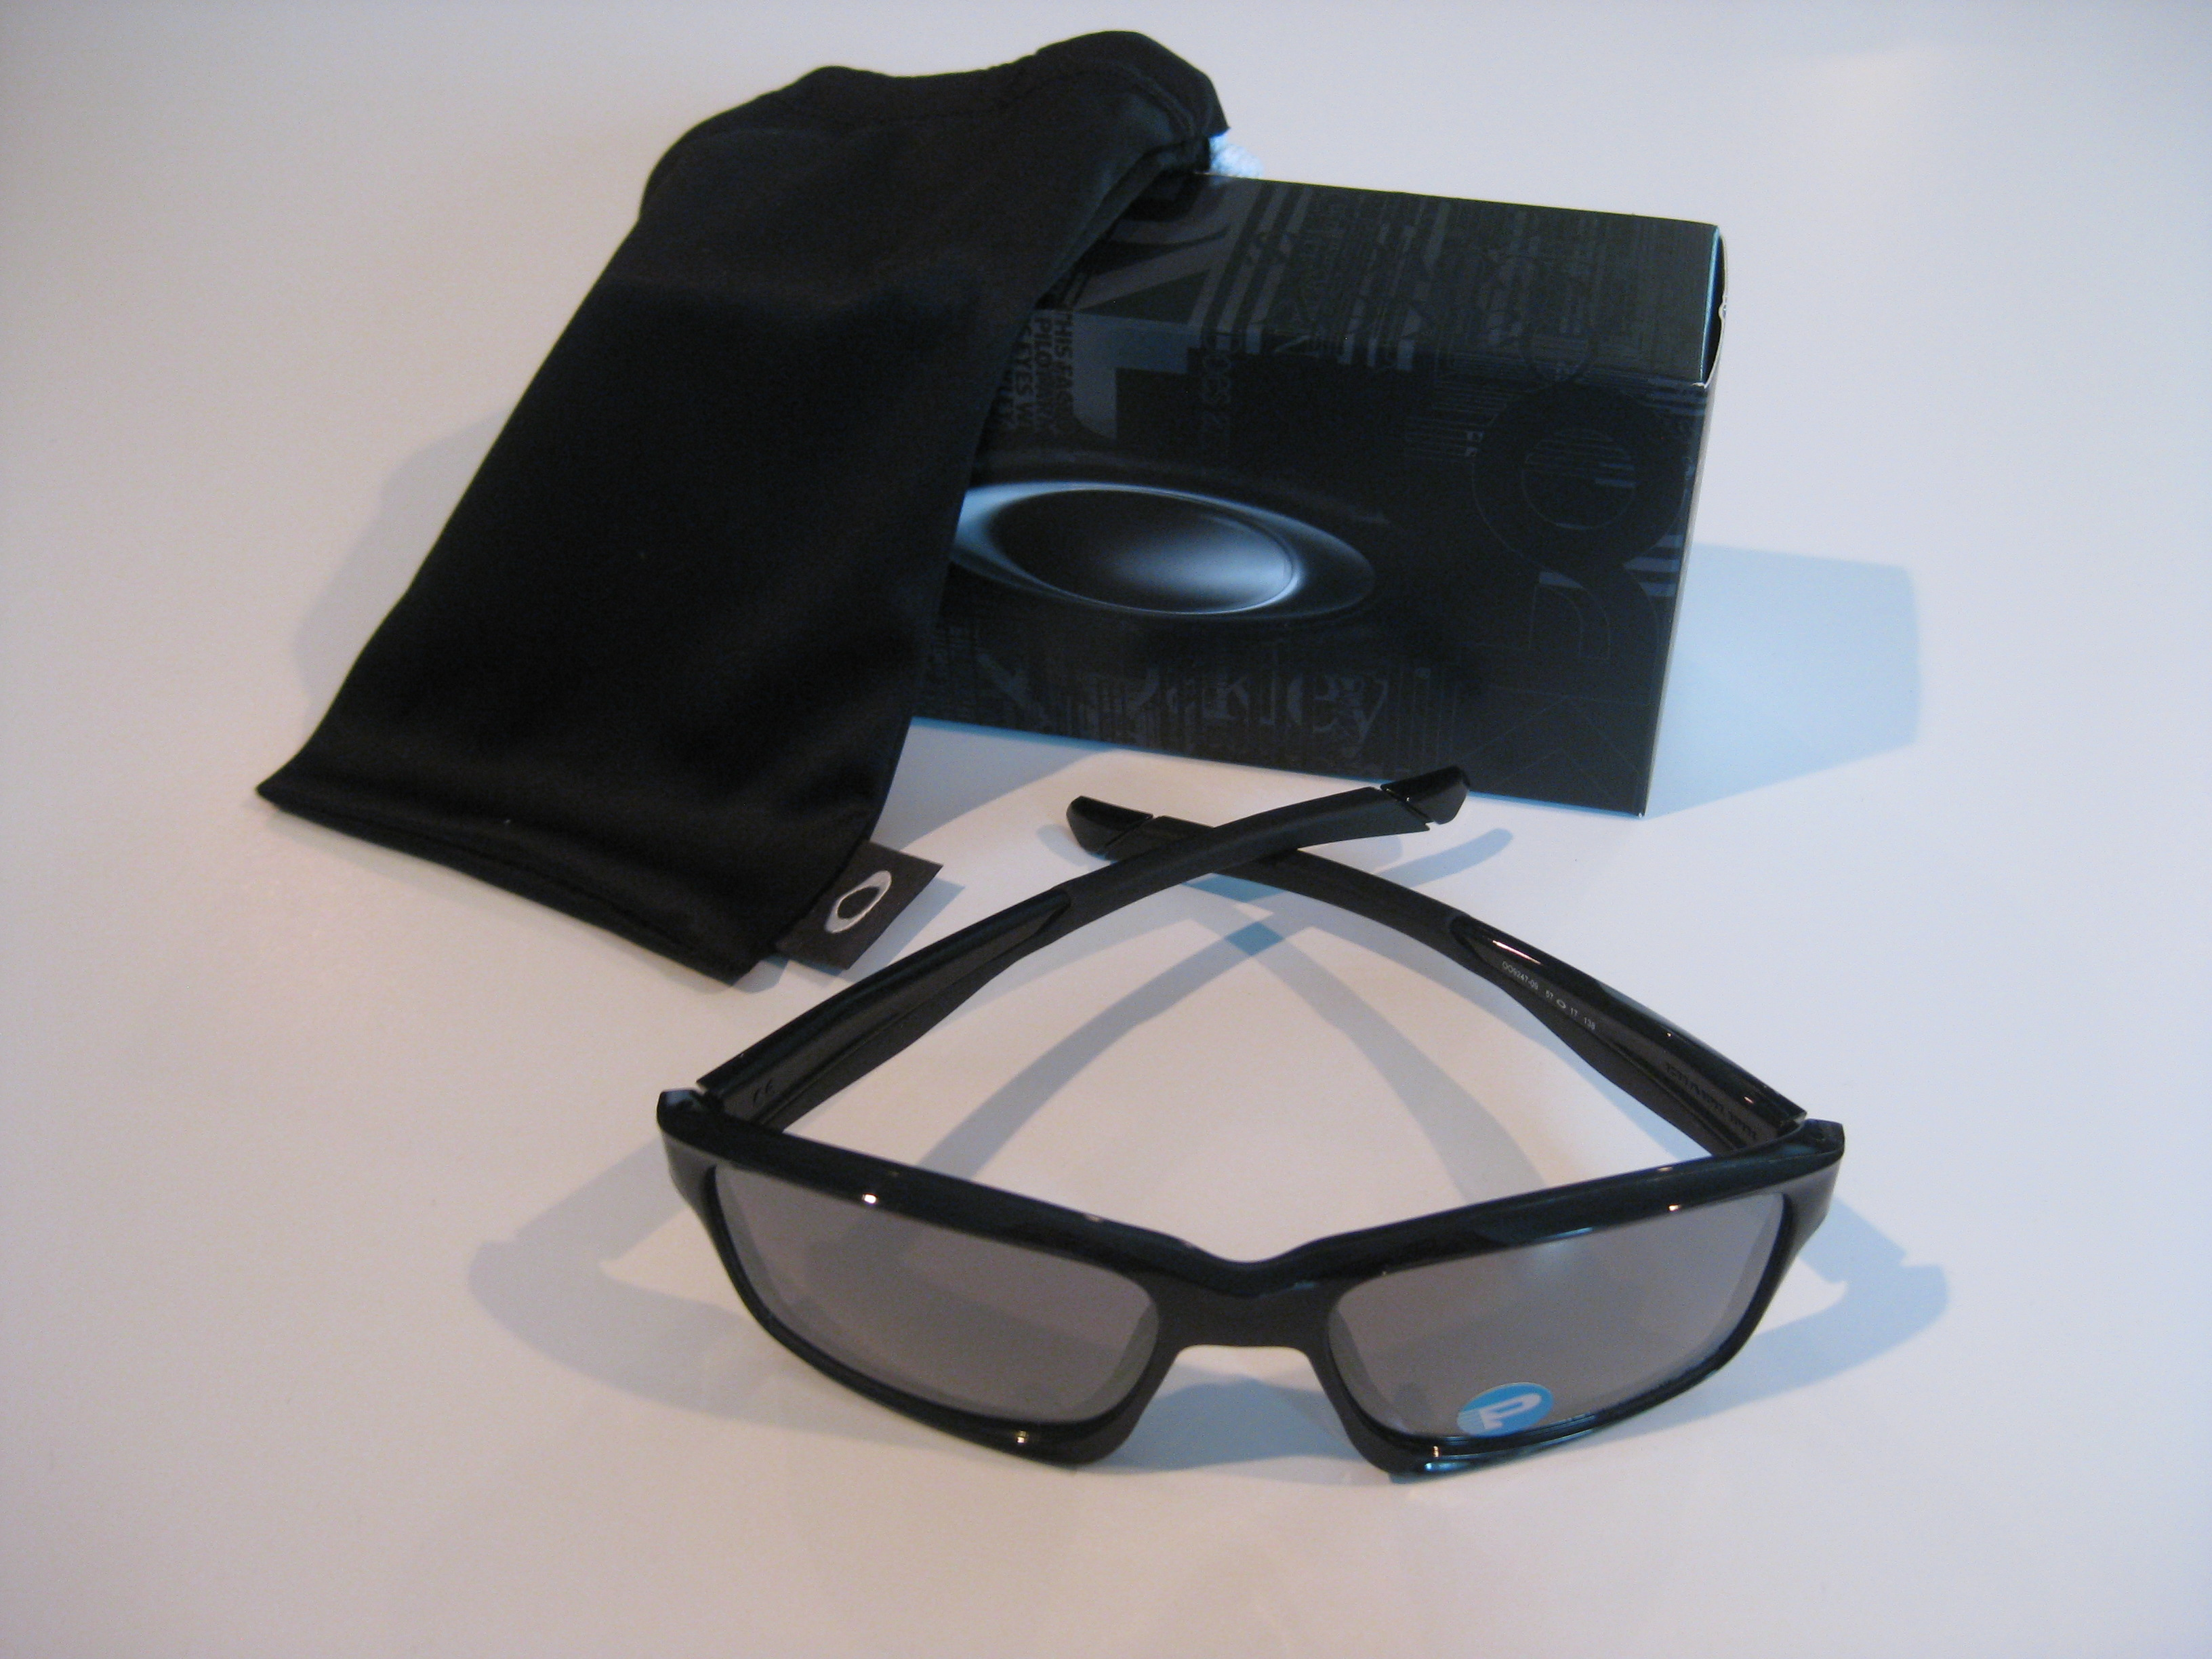 eeaa56ce16d3 New Oakley Chainlink Sunglasses Black Ink Black Iridium Polarized ...